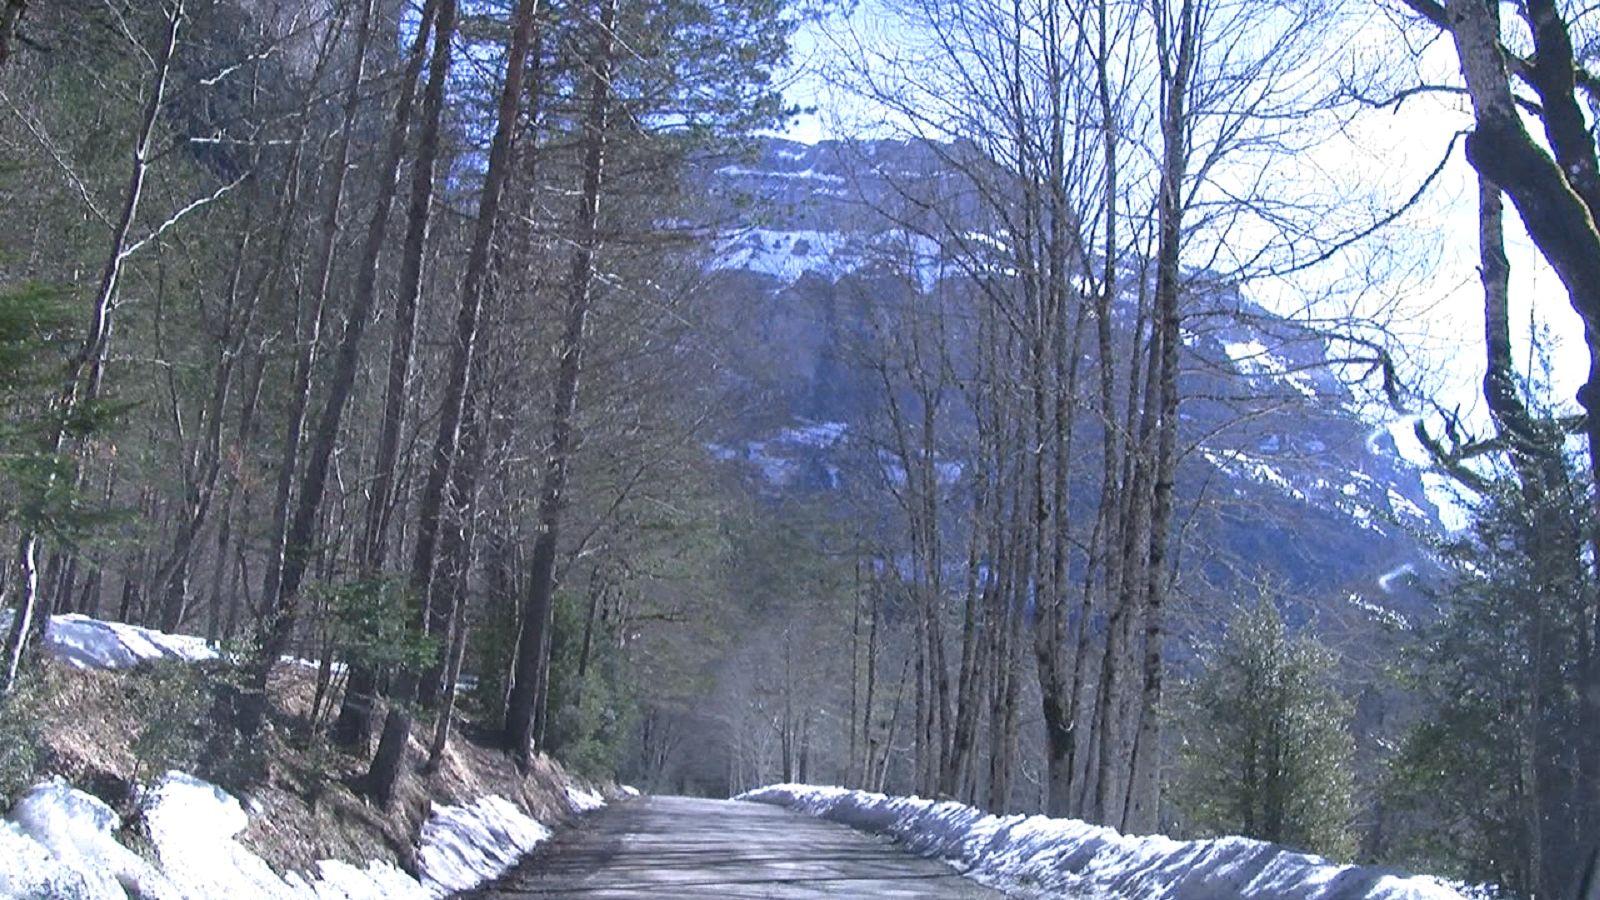 Carretera de acceso a Ordesa. Foto: SobrarbeDigital